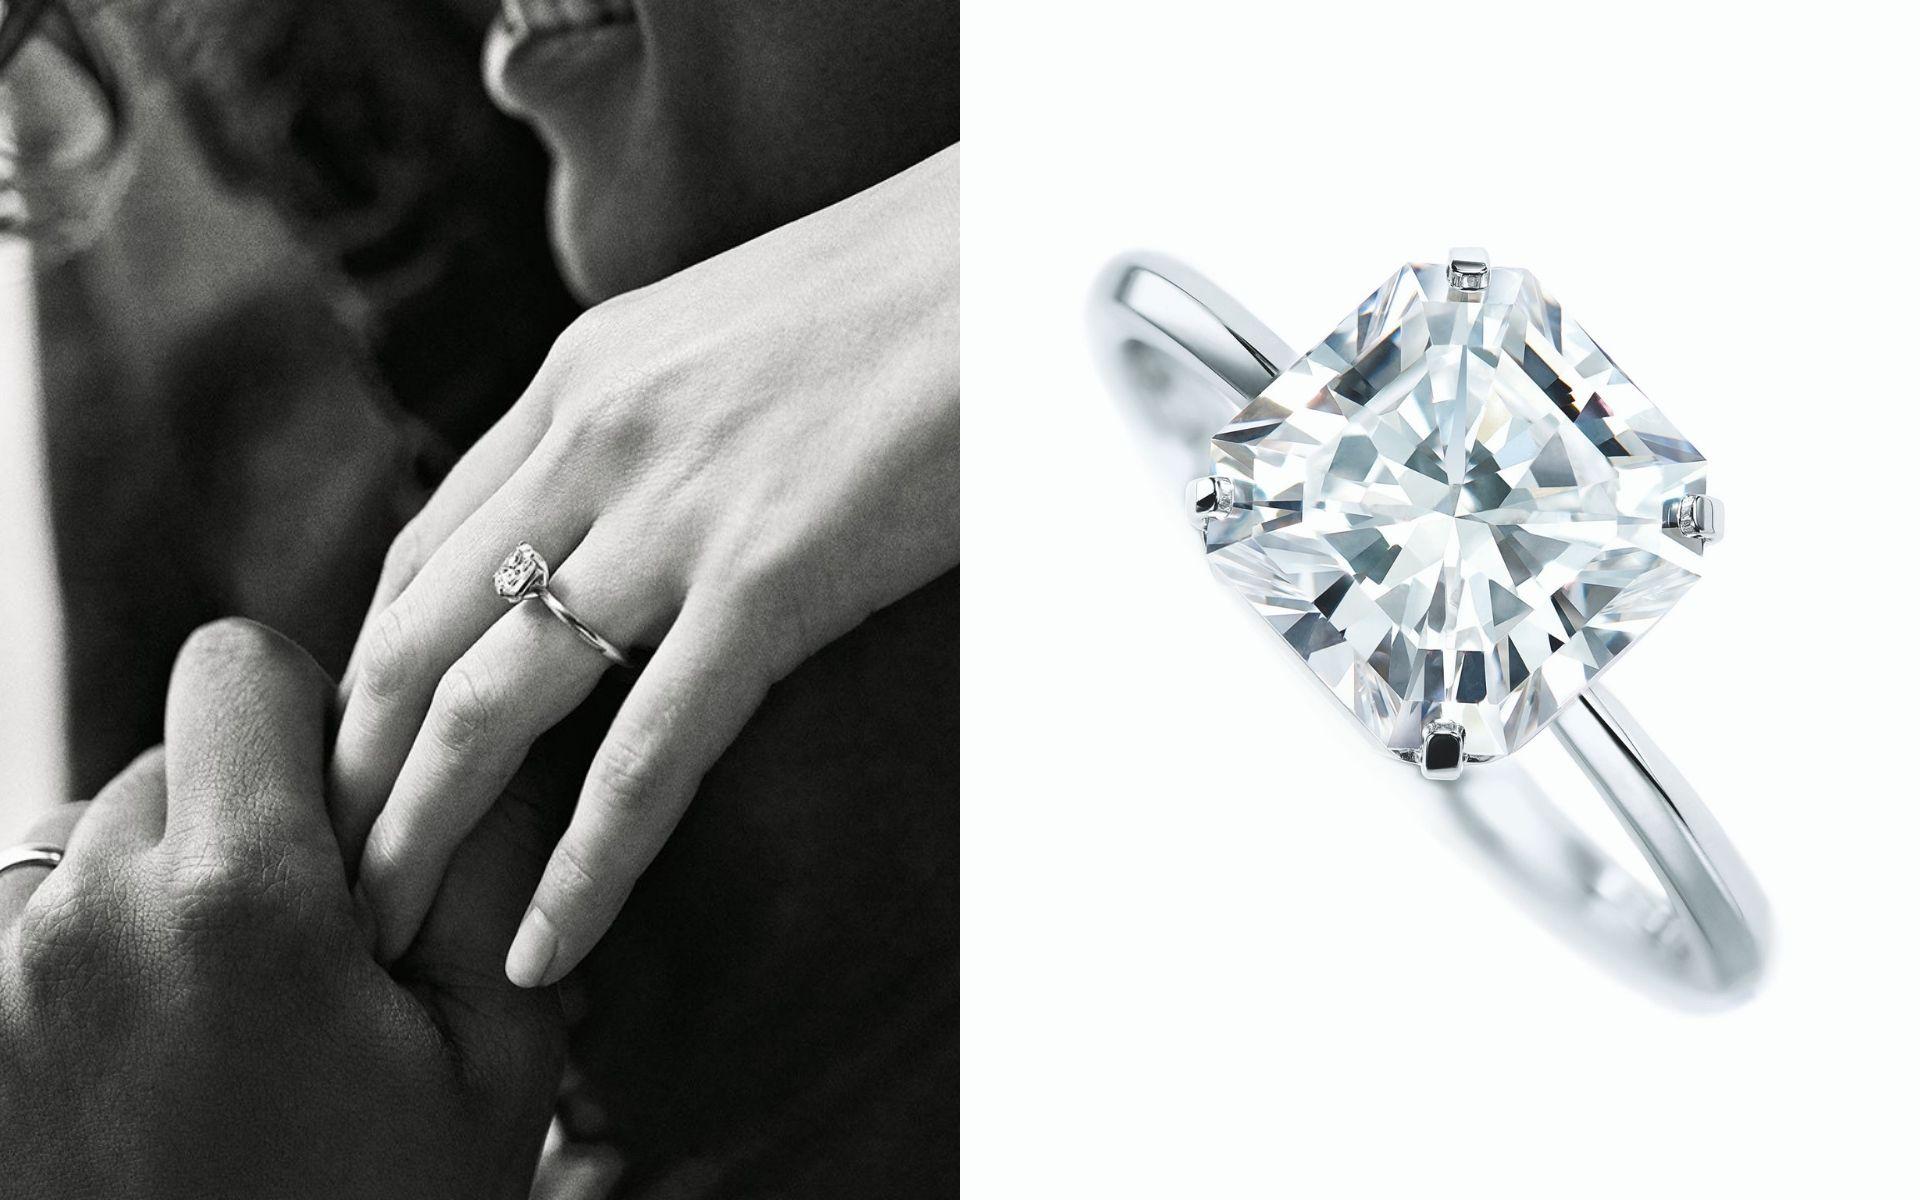 5300de45c3d51 The Brilliance Of True Love Captured In Tiffany & Co.'s Finest ...